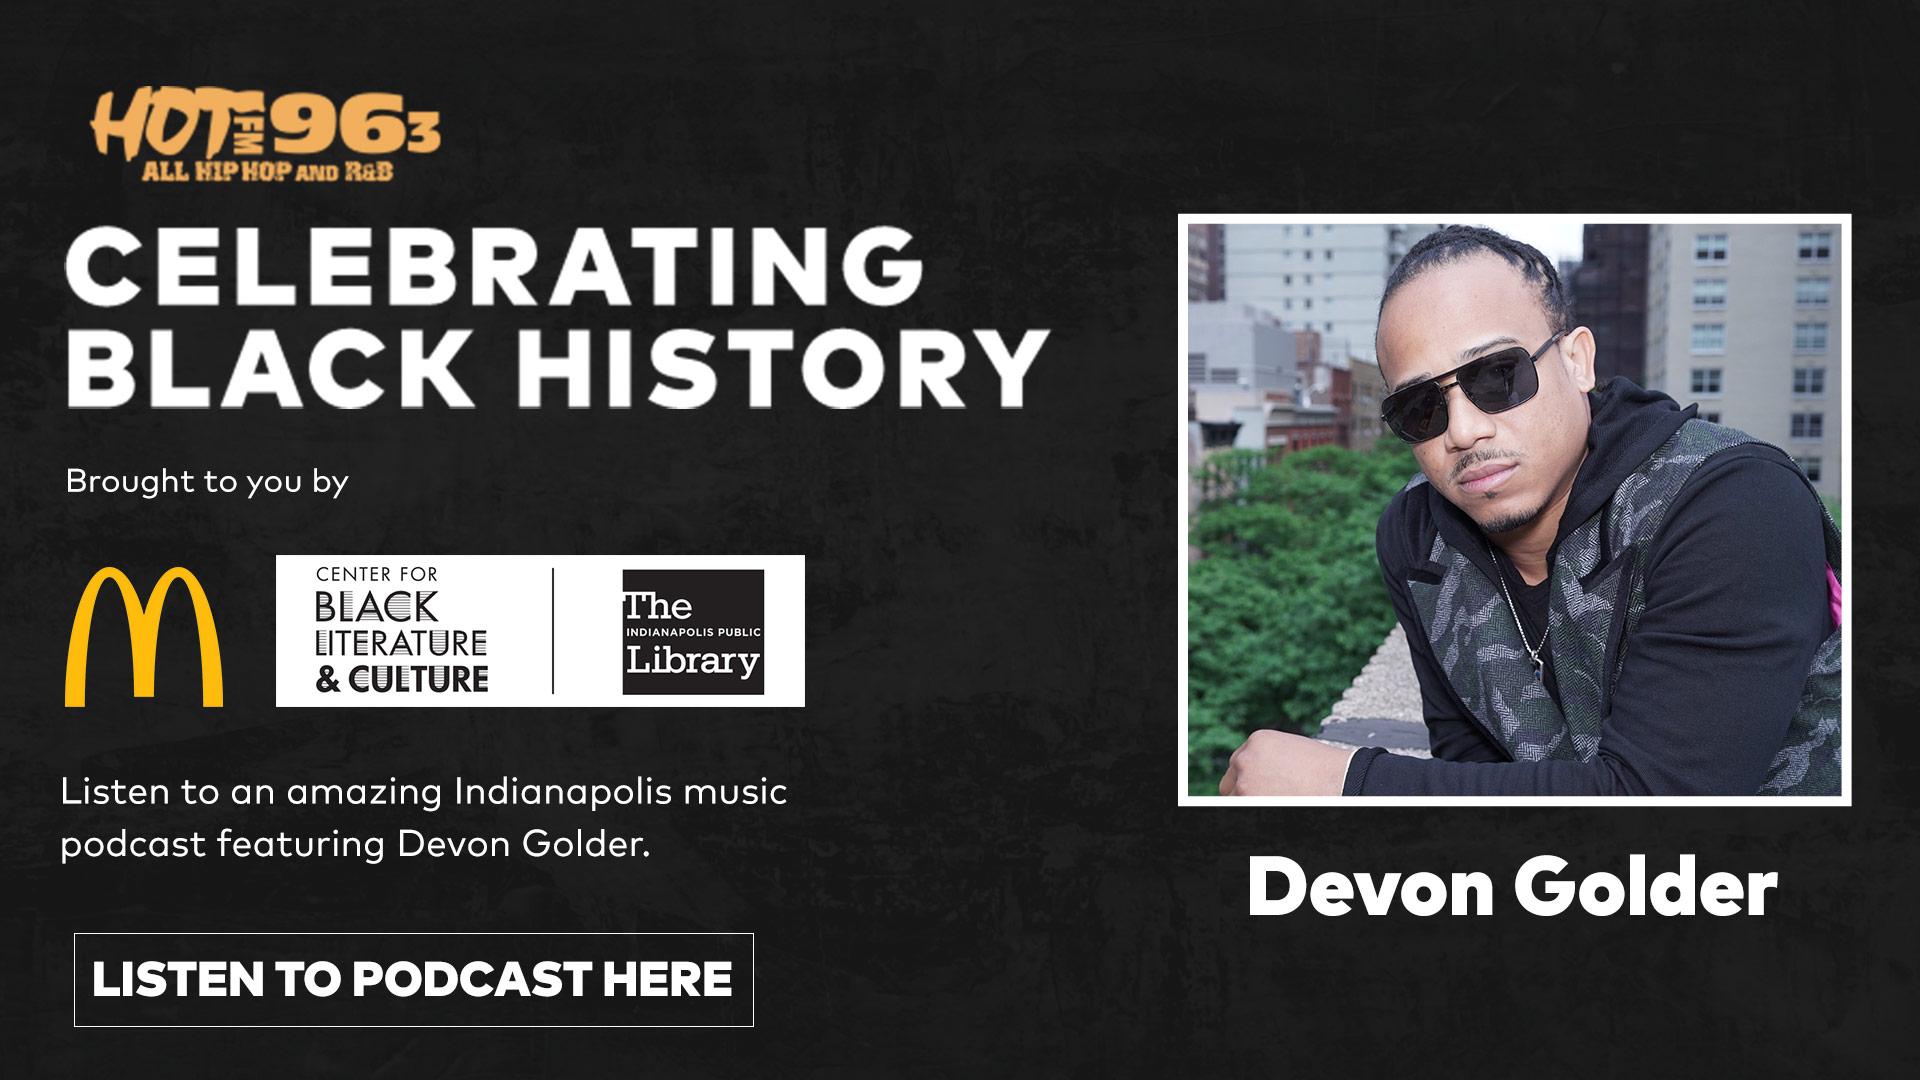 McDonald's Black History Month Podcast: Devon Golder